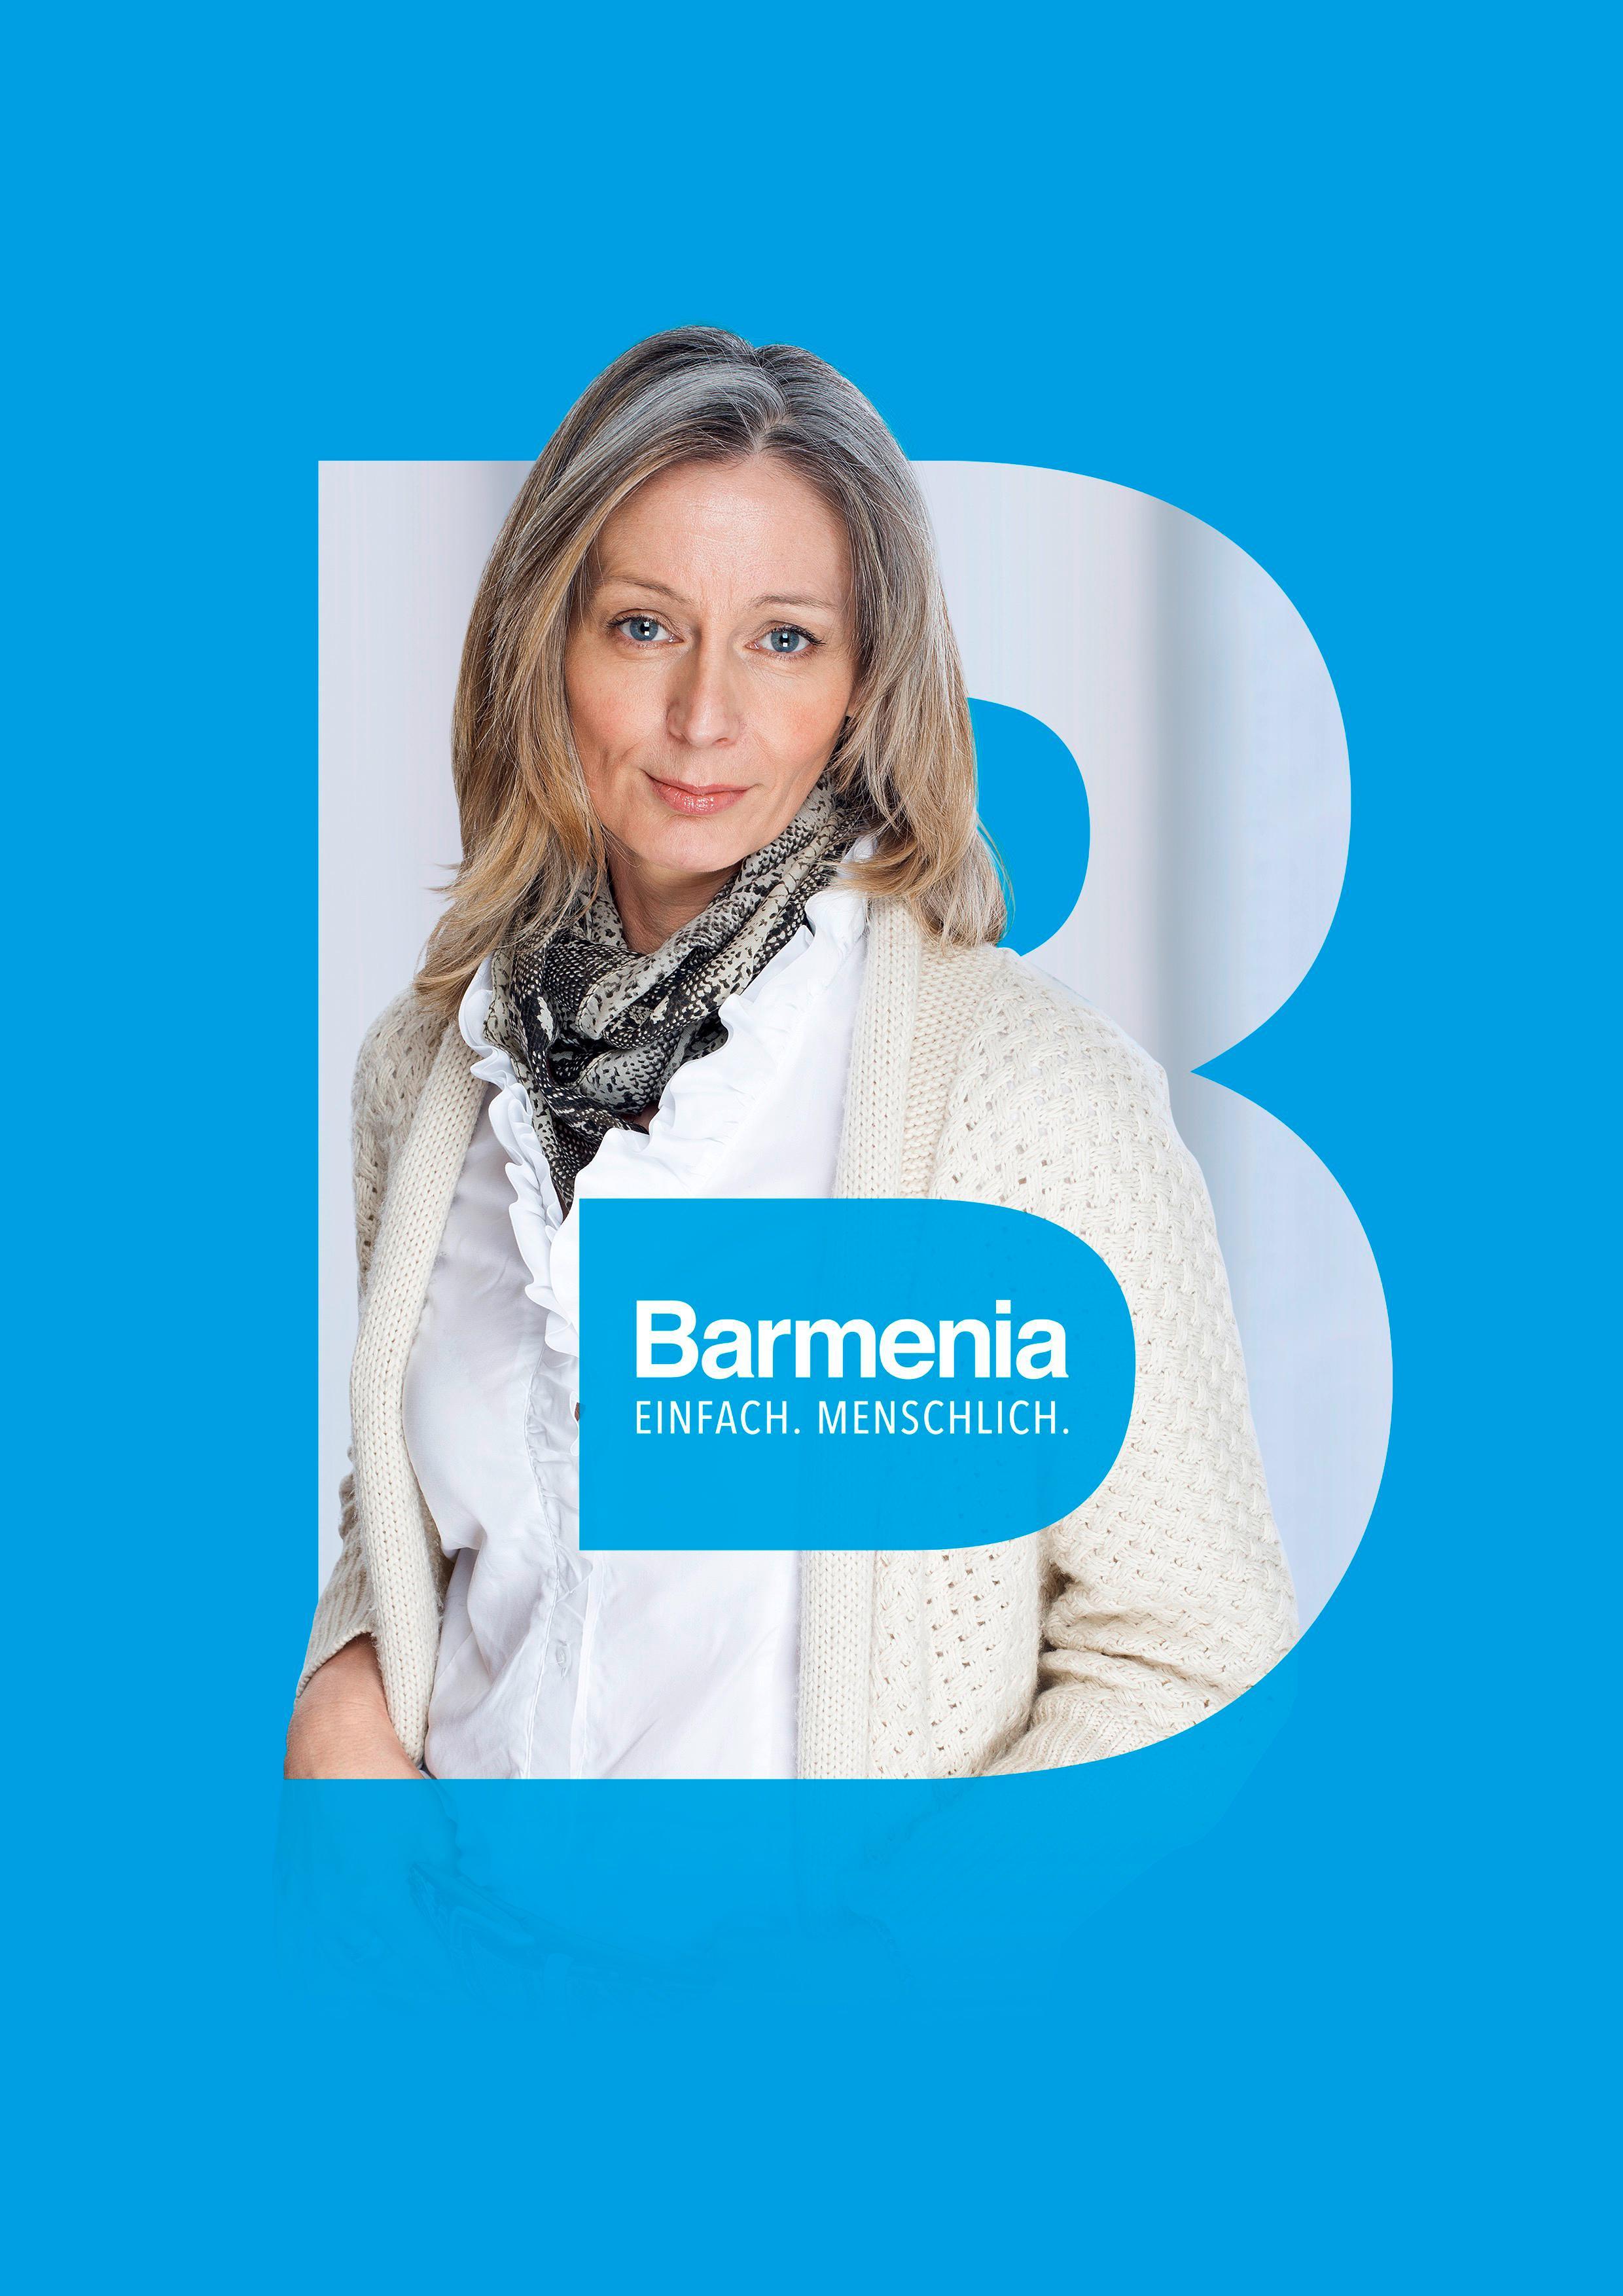 Barmenia Versicherung - Ute Zahrt